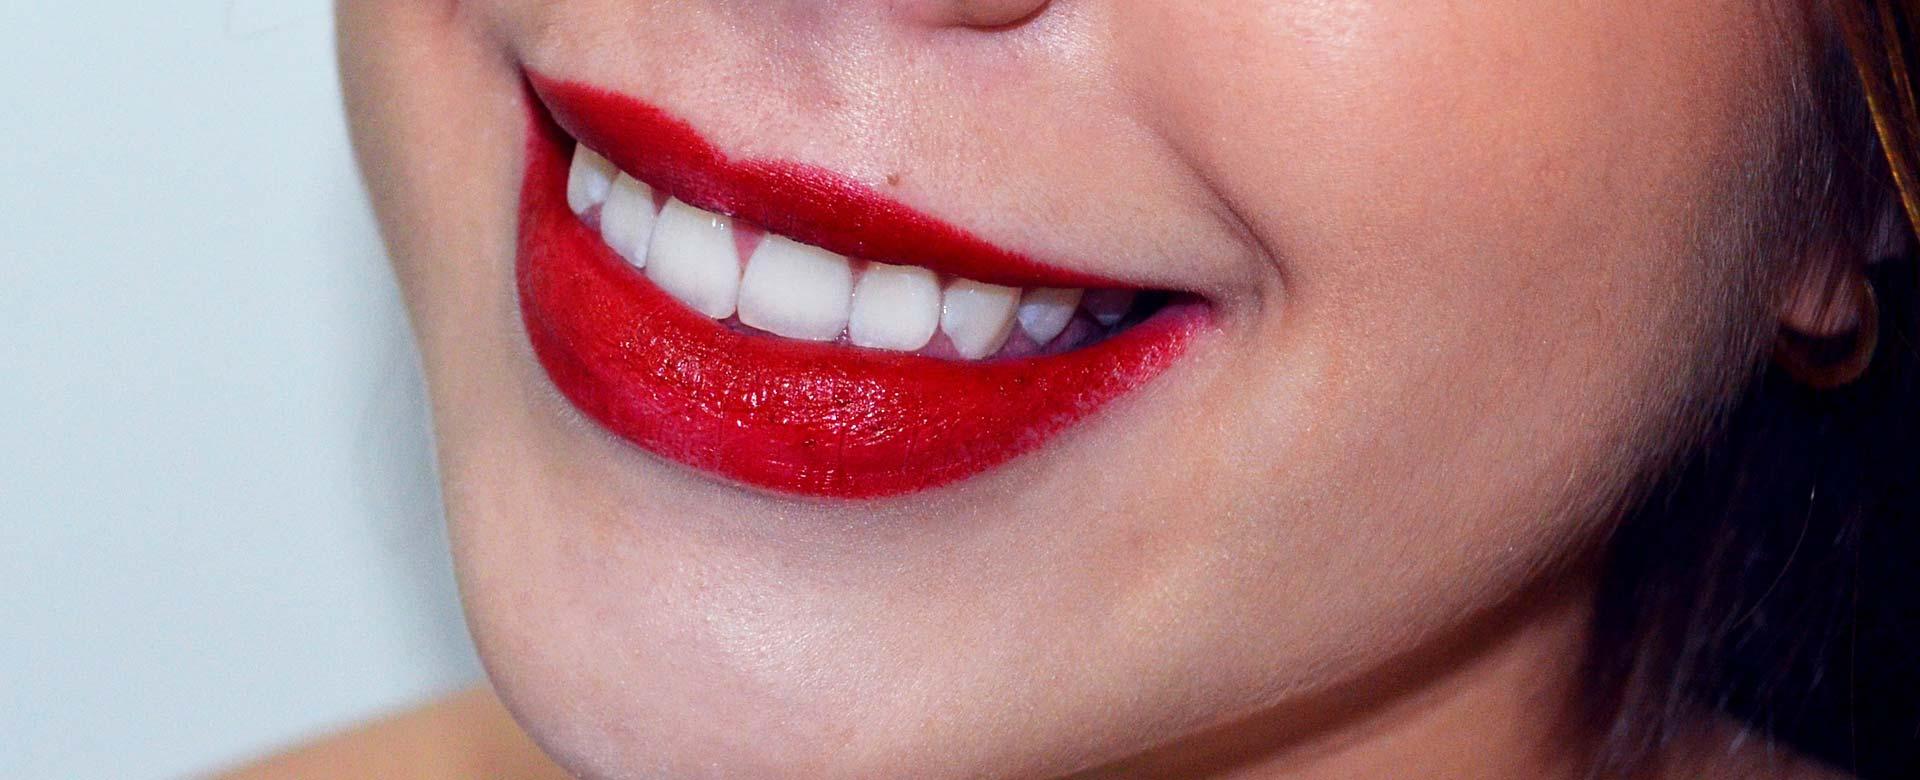 sonrisa-divina-sonrisa